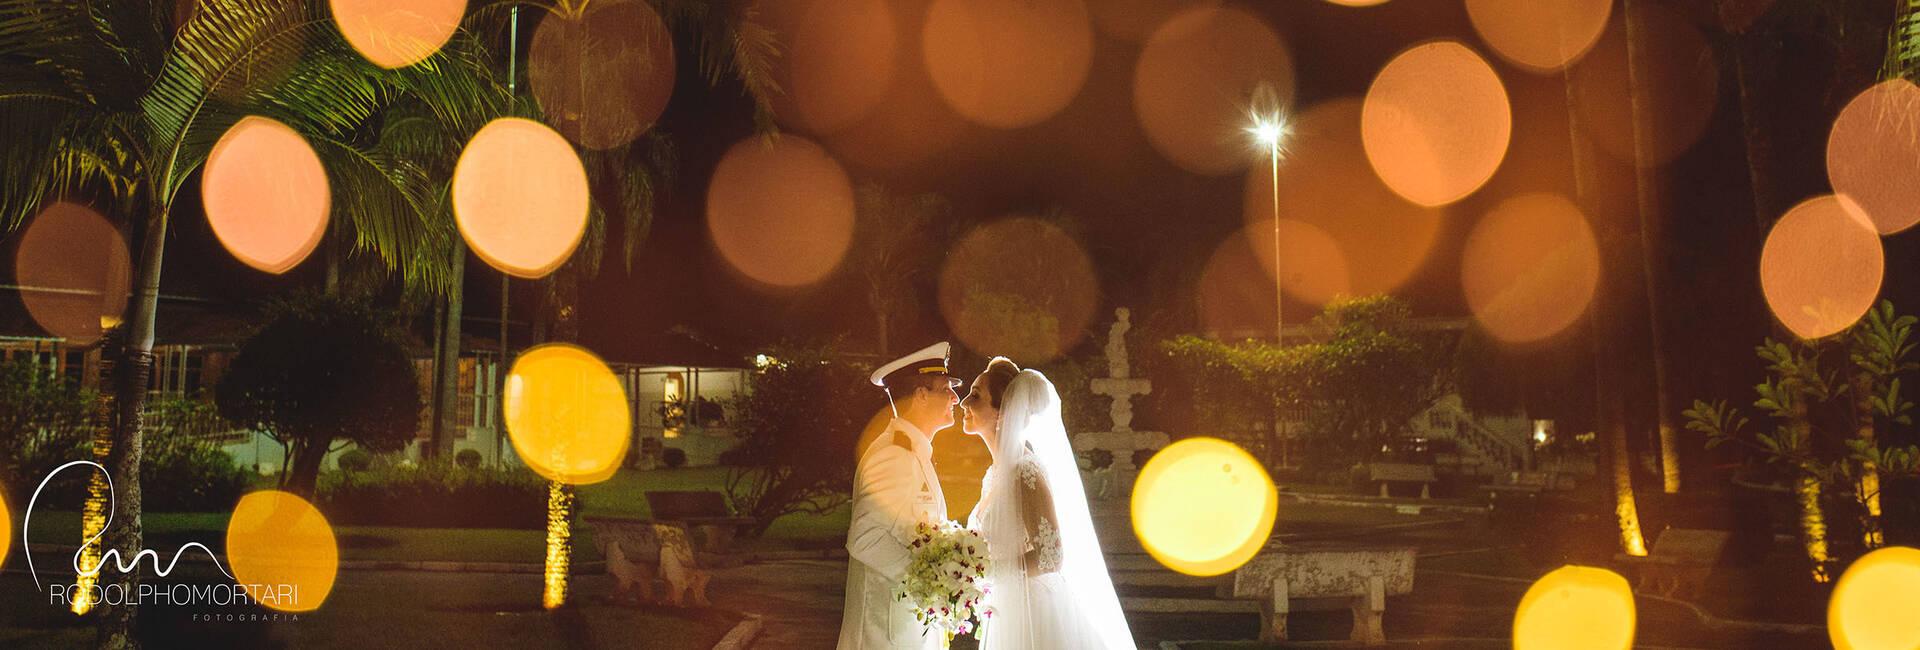 Casamento de Luciana e Wagner